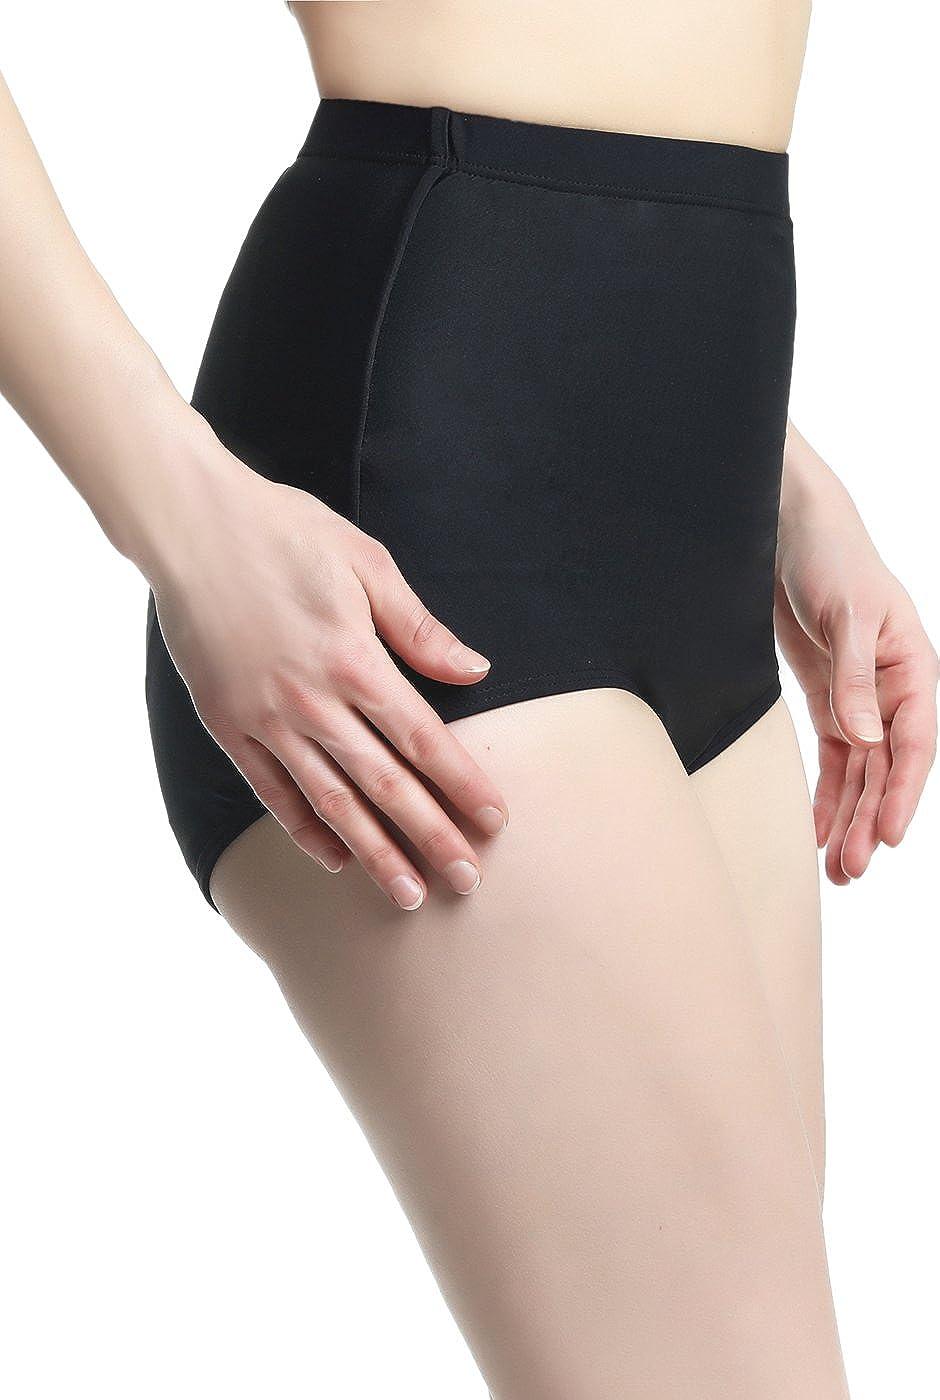 Regular /& Plus Size phistic Womens UPF 50 Full Coverage Swim Brief Bottoms